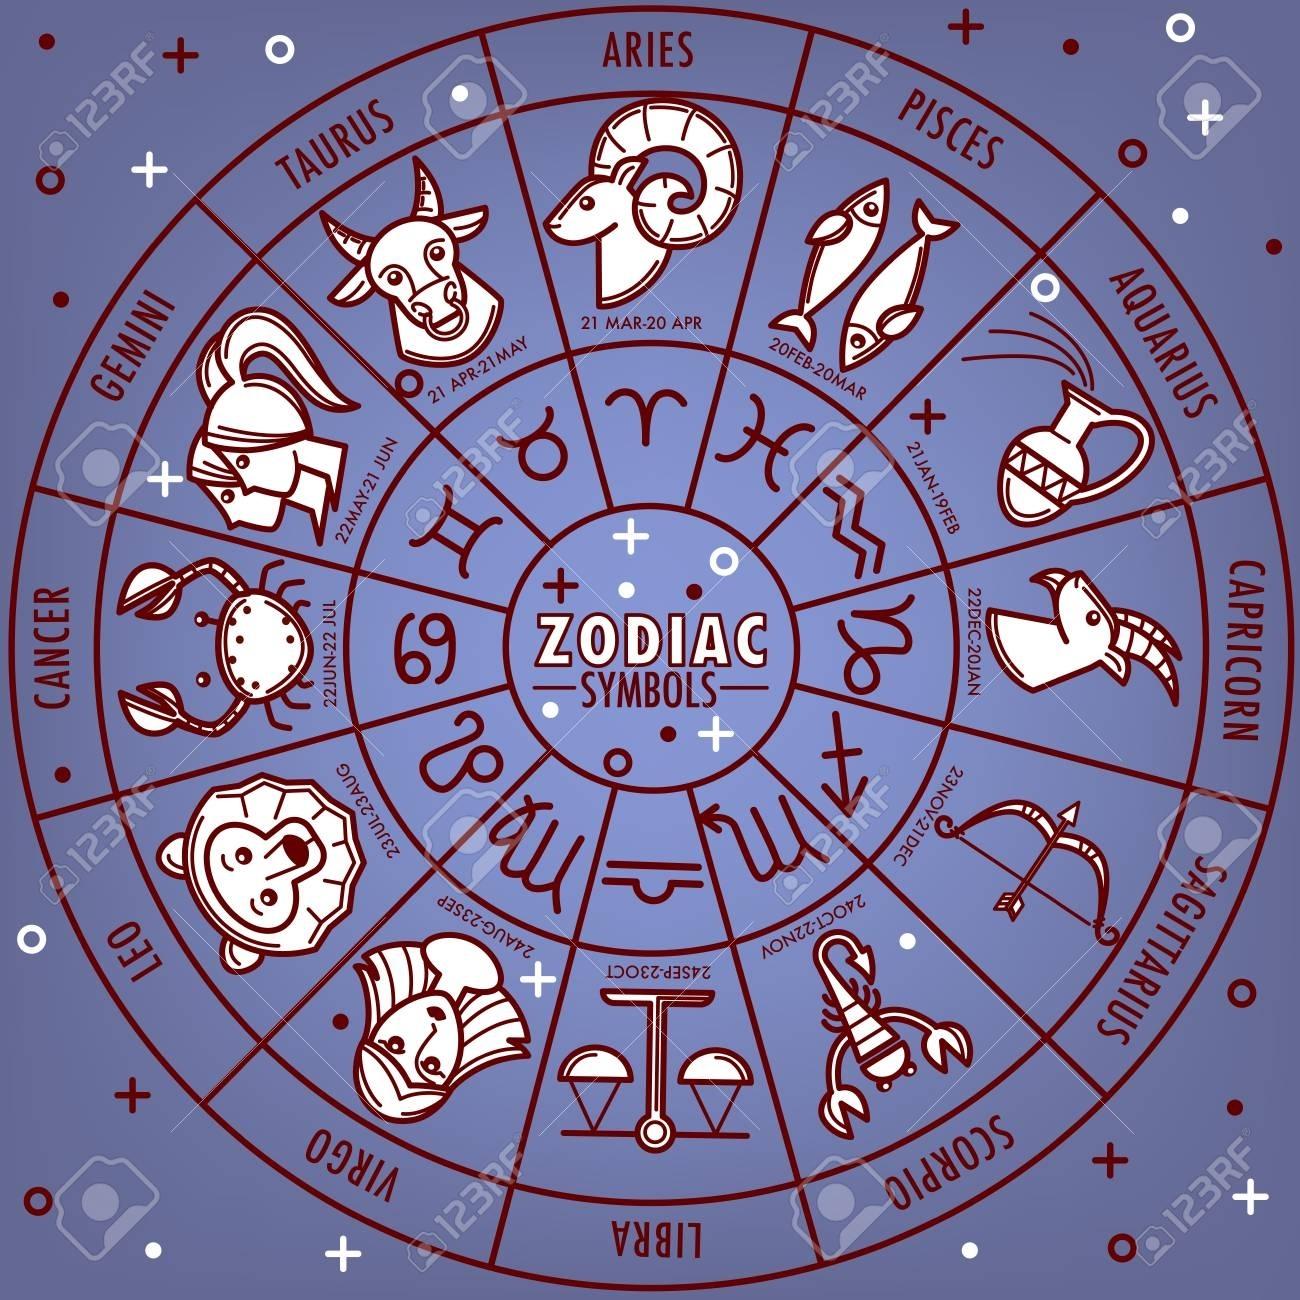 Zodiac Horoscope Signs With Birth Dates On Zodiac Circle Wheel